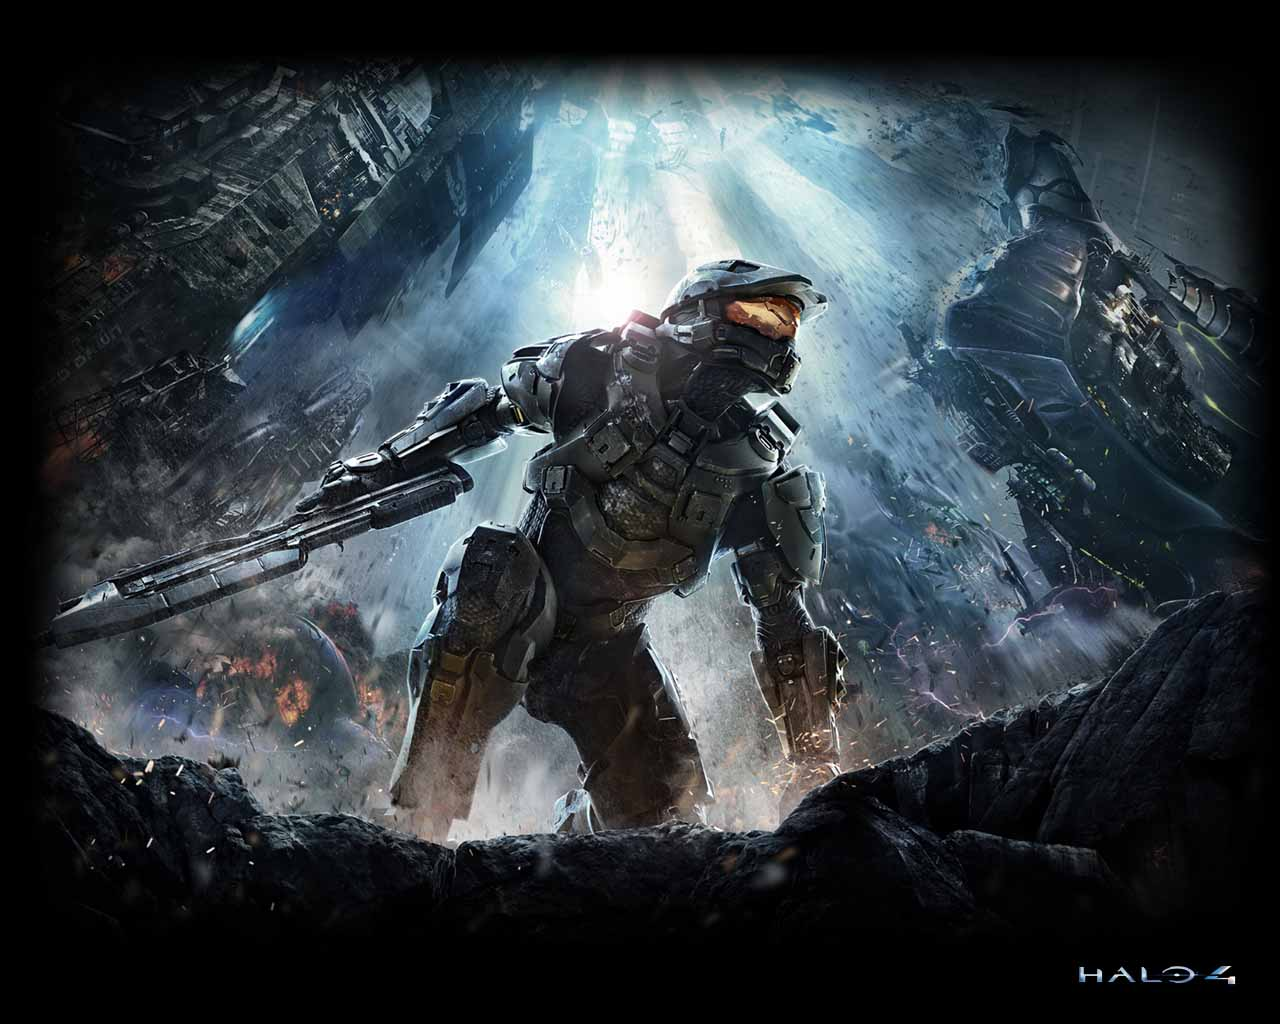 49+ Halo 1080p Wallpaper on WallpaperSafari